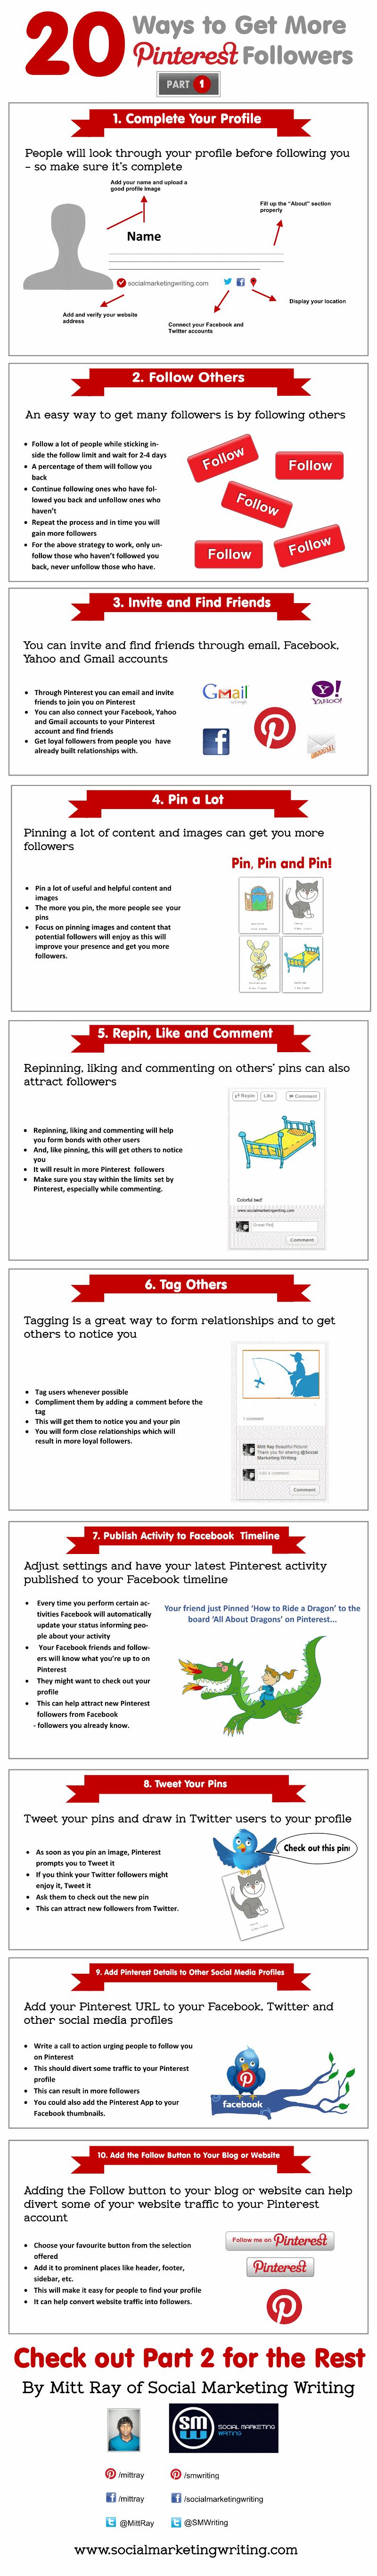 20 Ways to Increase Pinterest Followers